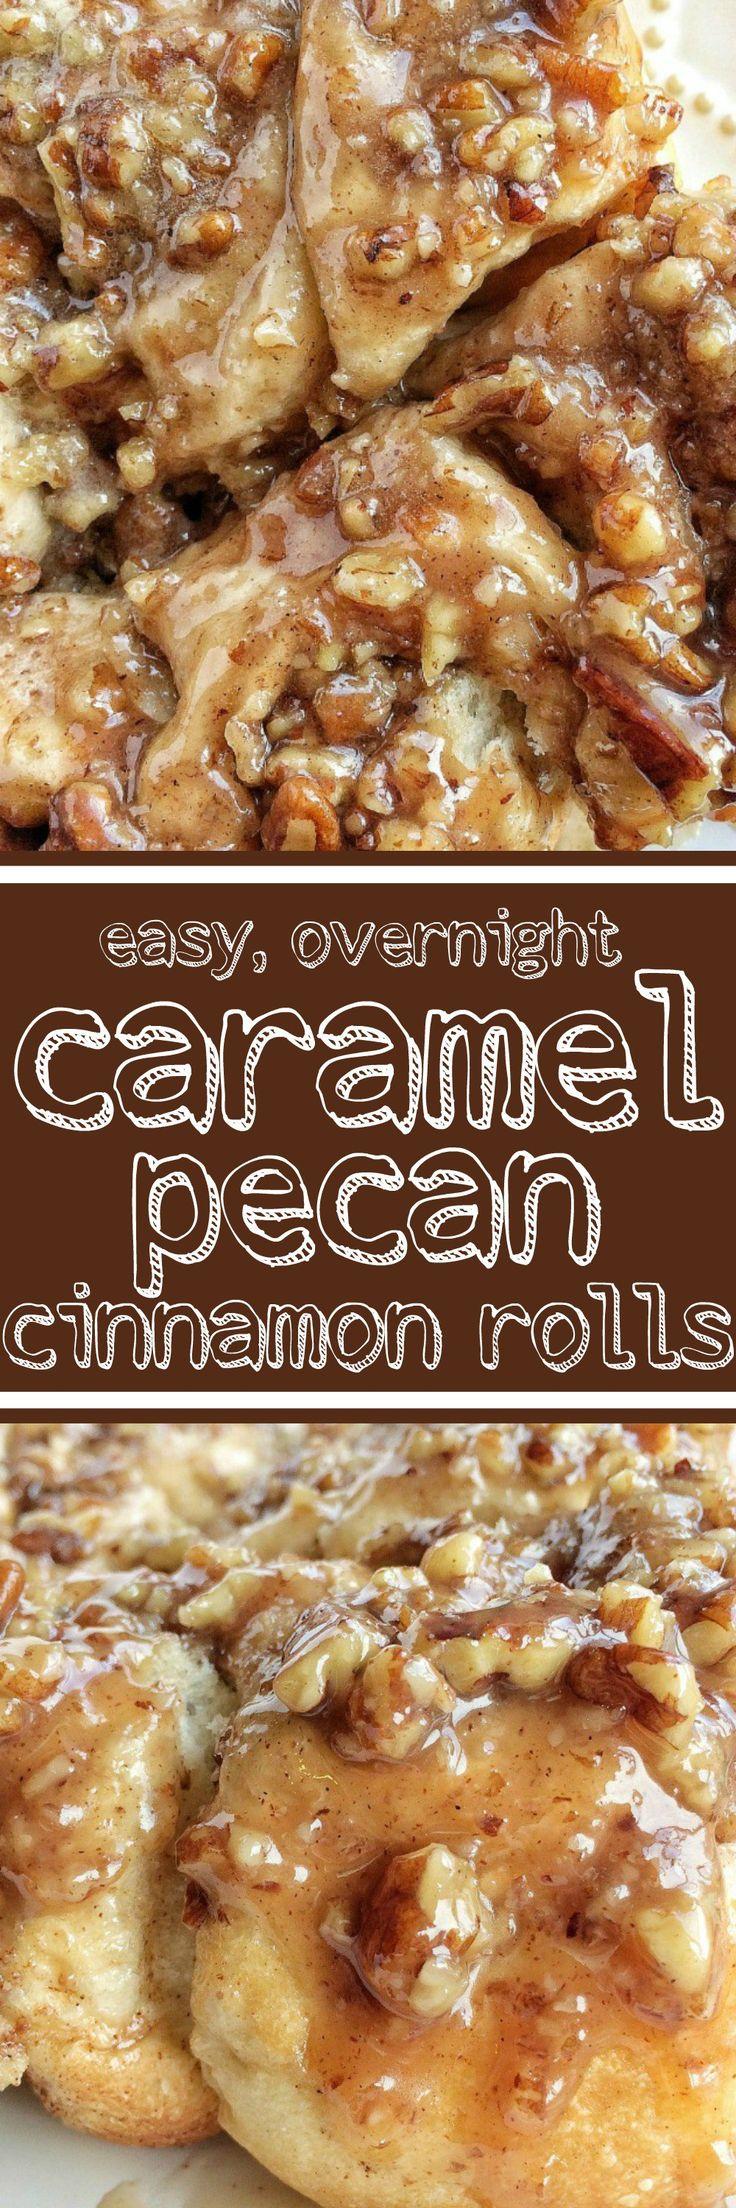 Overnight Caramel Pecan Cinnamon Rolls | Breakfast | Cinnamon Rolls | Easy Cinnamon Rolls | Christmas Breakfast | Breakfast | Easy | No Yeast | www.togetherasfamily.com #cinnamonrollrecipes #cinnamonrolls #christmasbreakfast #noyeastcinnamonrolls #easyrecipes